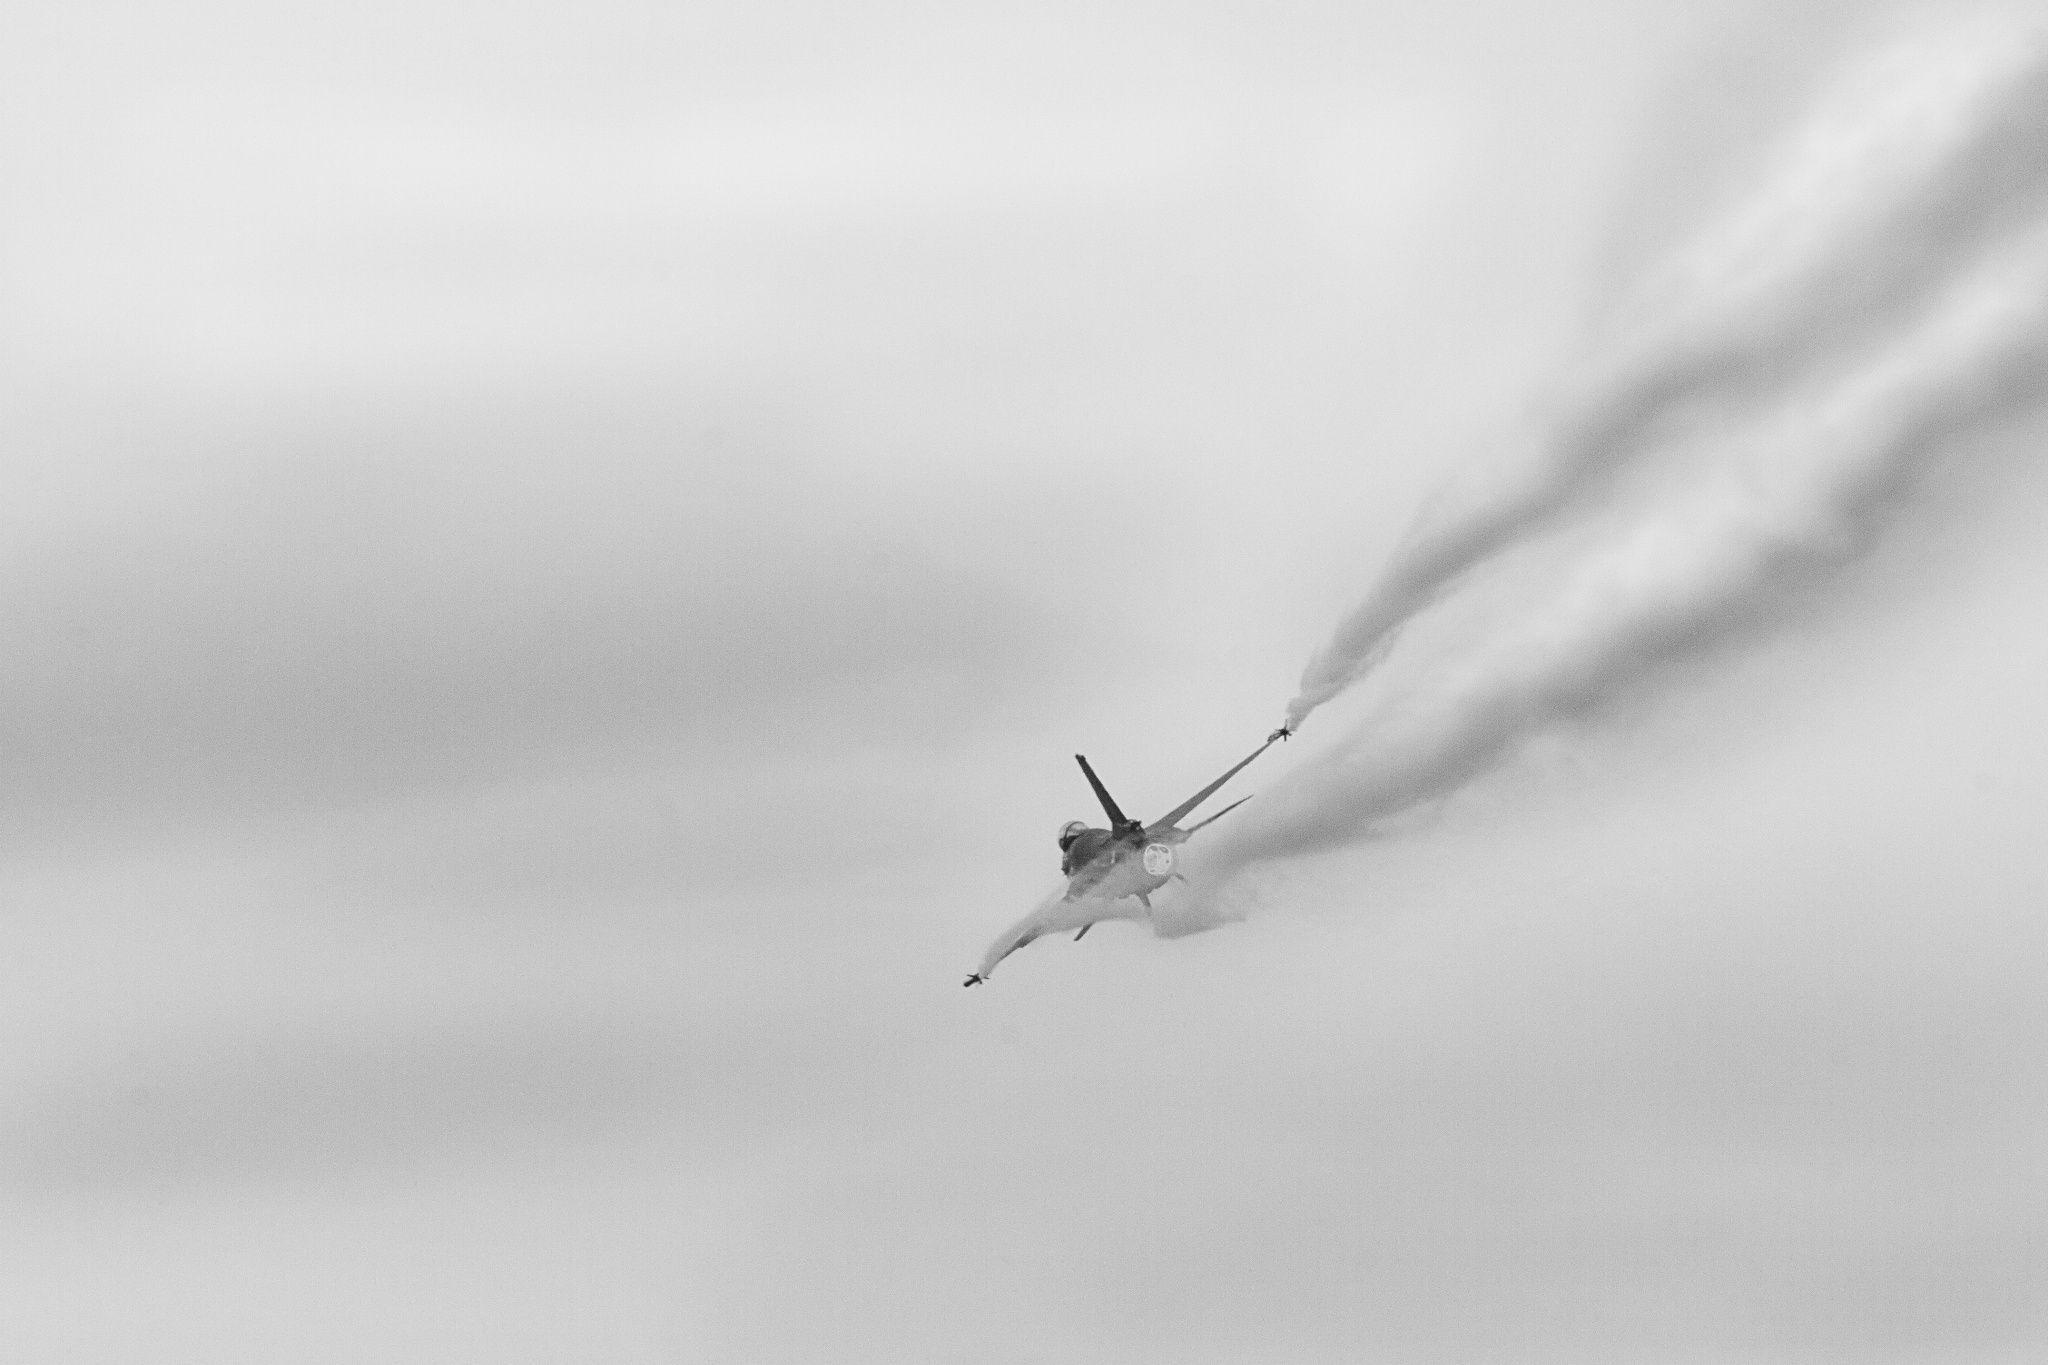 F16 by Matej Opálený / 500px